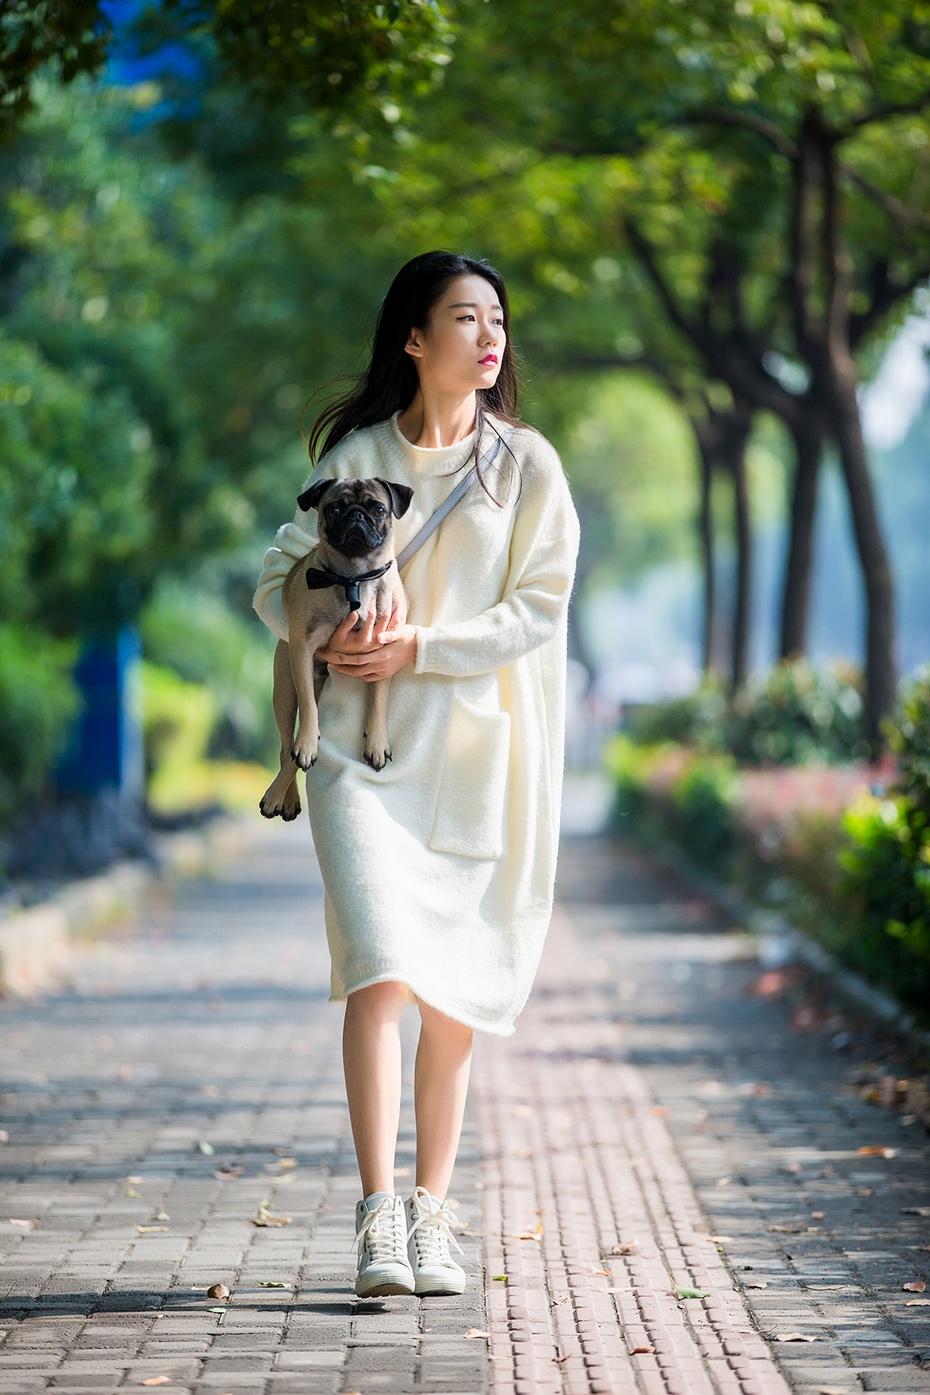 [Ava搭配周记]我有我风格 - AvaFoo - Avas Fashion Blog